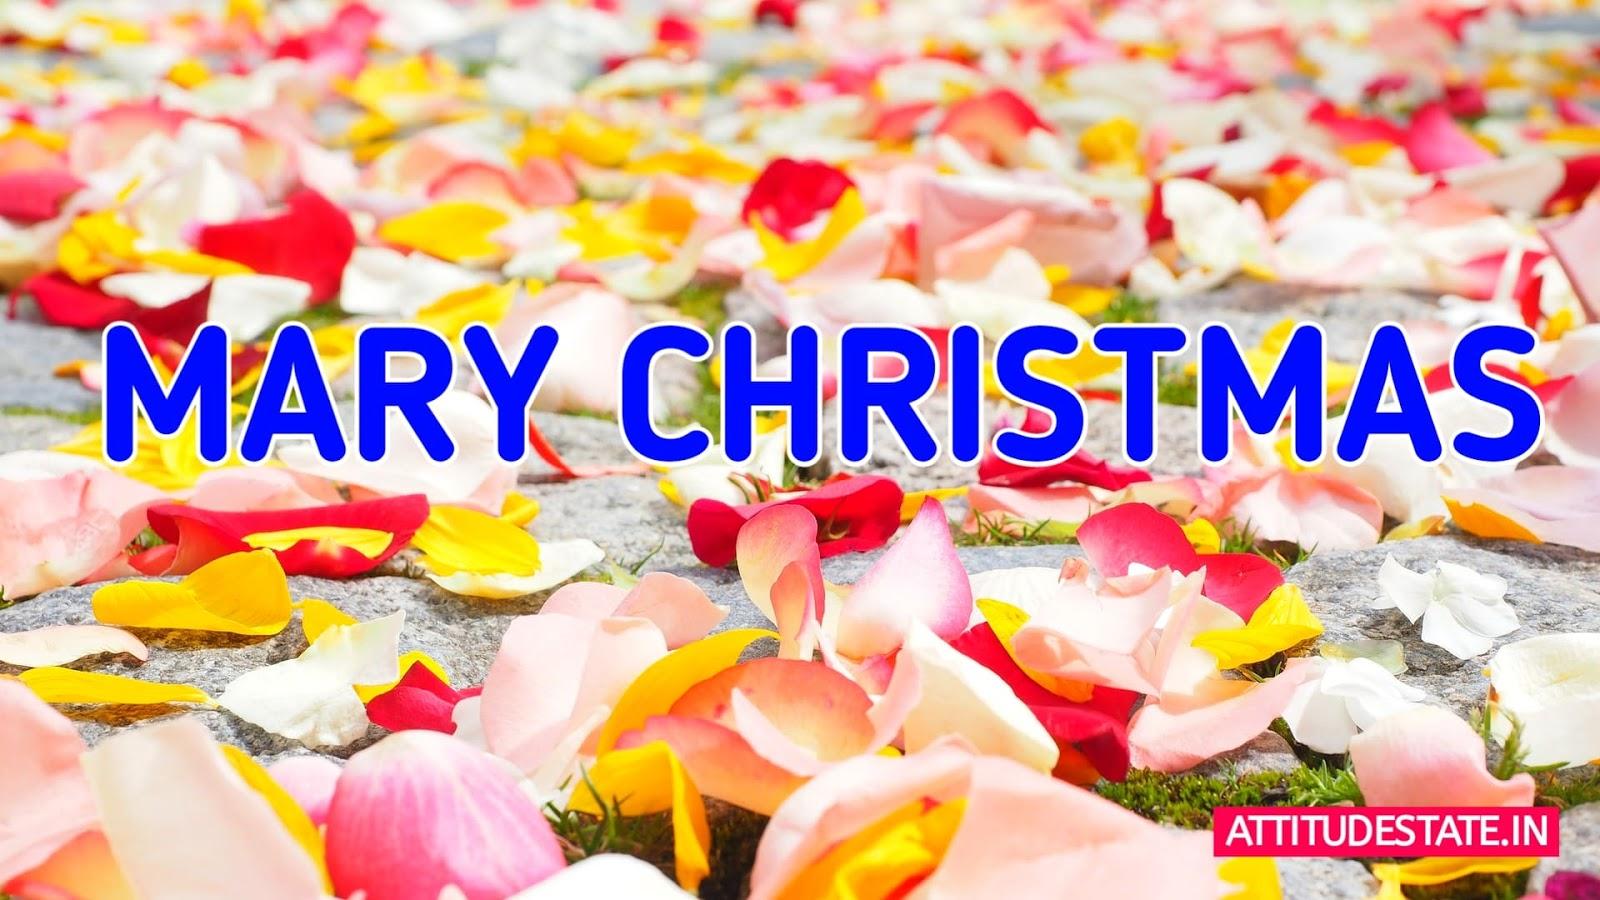 1,000+ Free Merry Christmas & Christmas Images